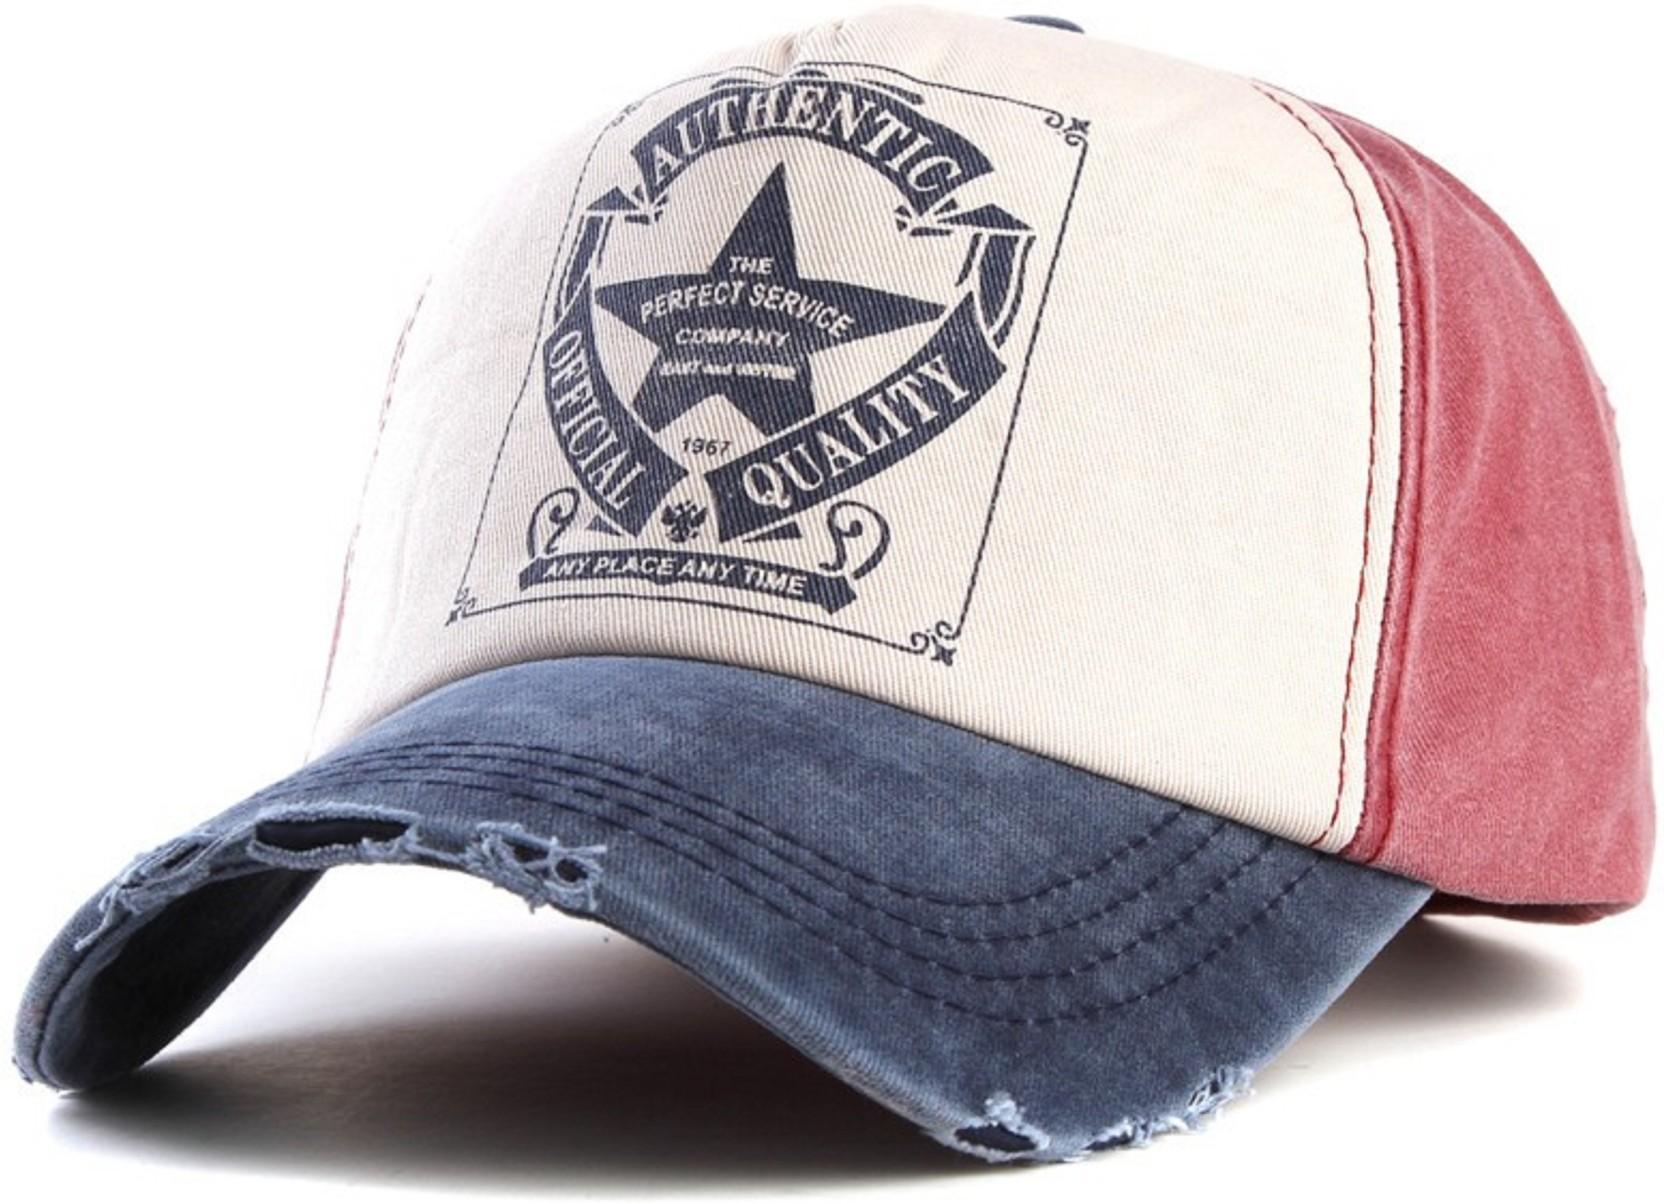 Fashion style Caps stylish flipkart for woman